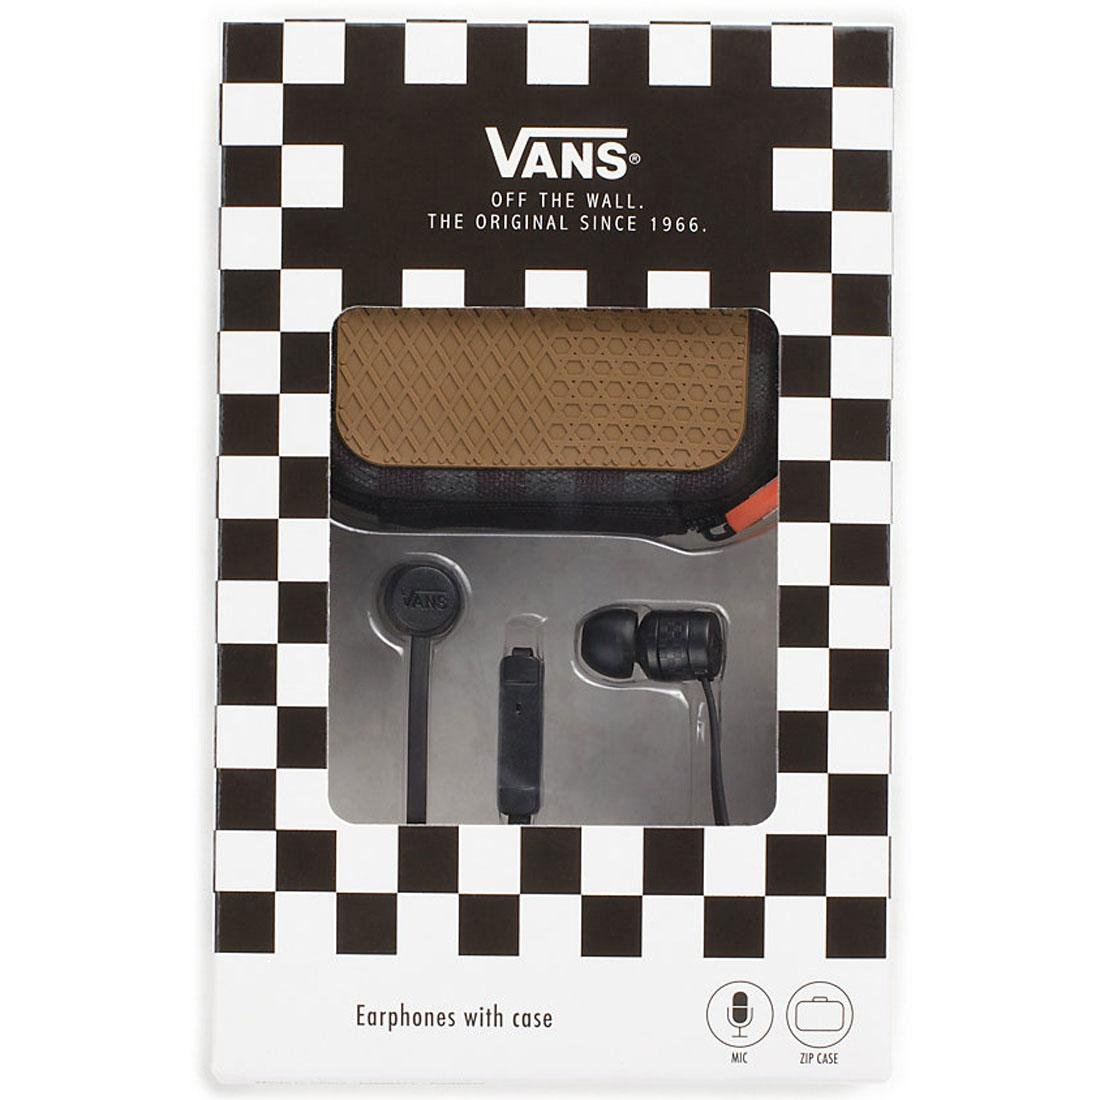 Vans shoes clothing more amazon vans ear phones with case black amipublicfo Choice Image